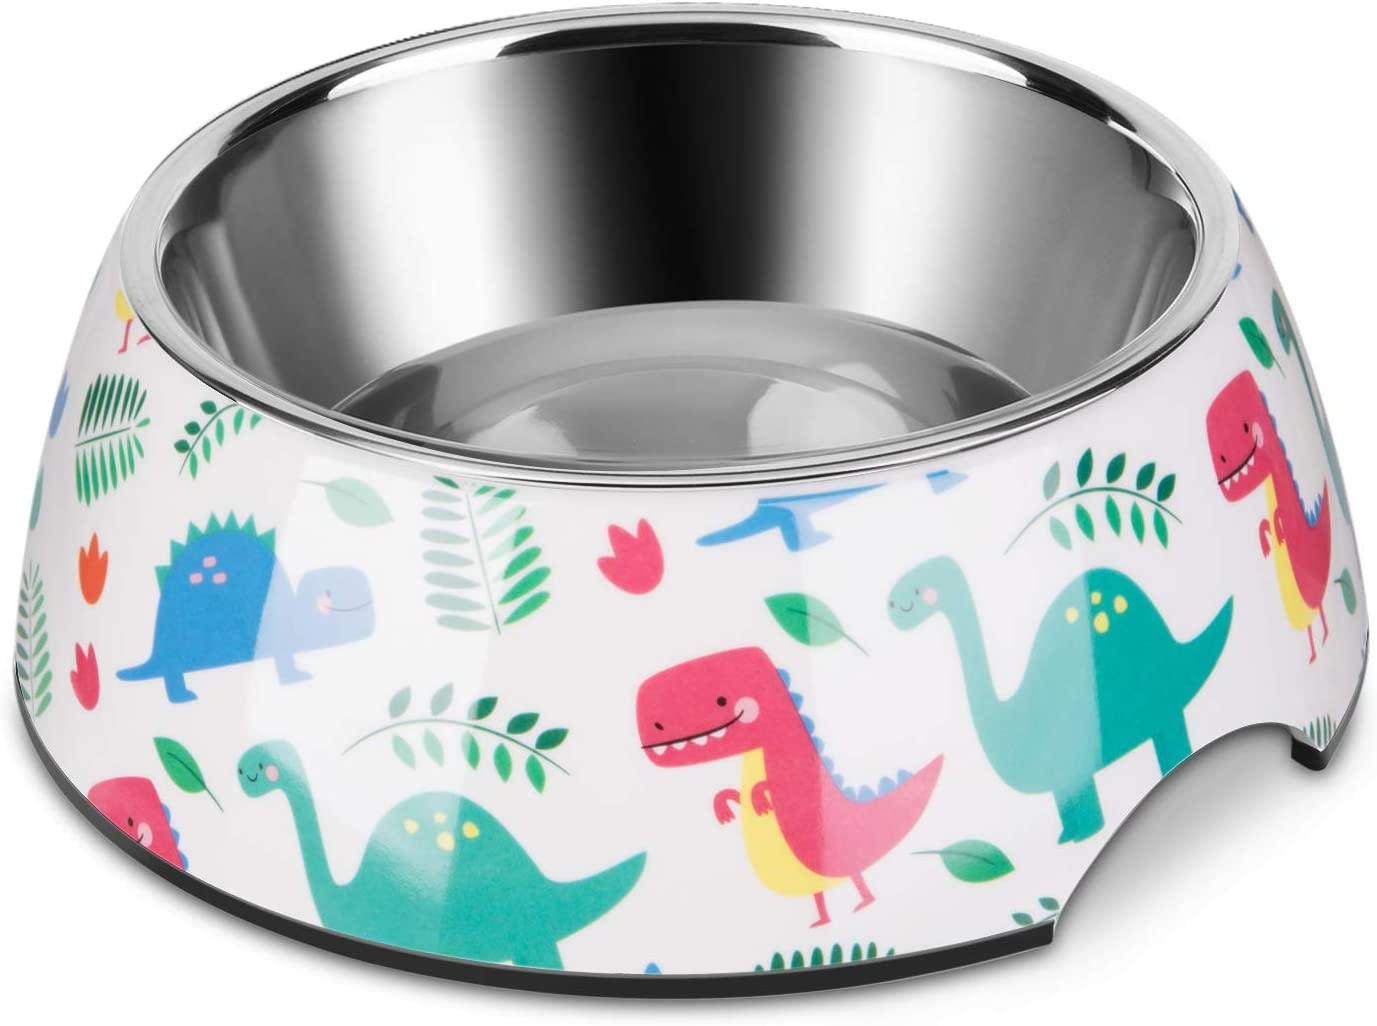 Flexzion Stainless Steel Dog Bowl Cat Dish - Anti-Slip Slip Resistant Rubber Base Pet Feeder, Dishwasher Safe & Rust Resistant with Removable Food Water Holder 24 Fl Oz